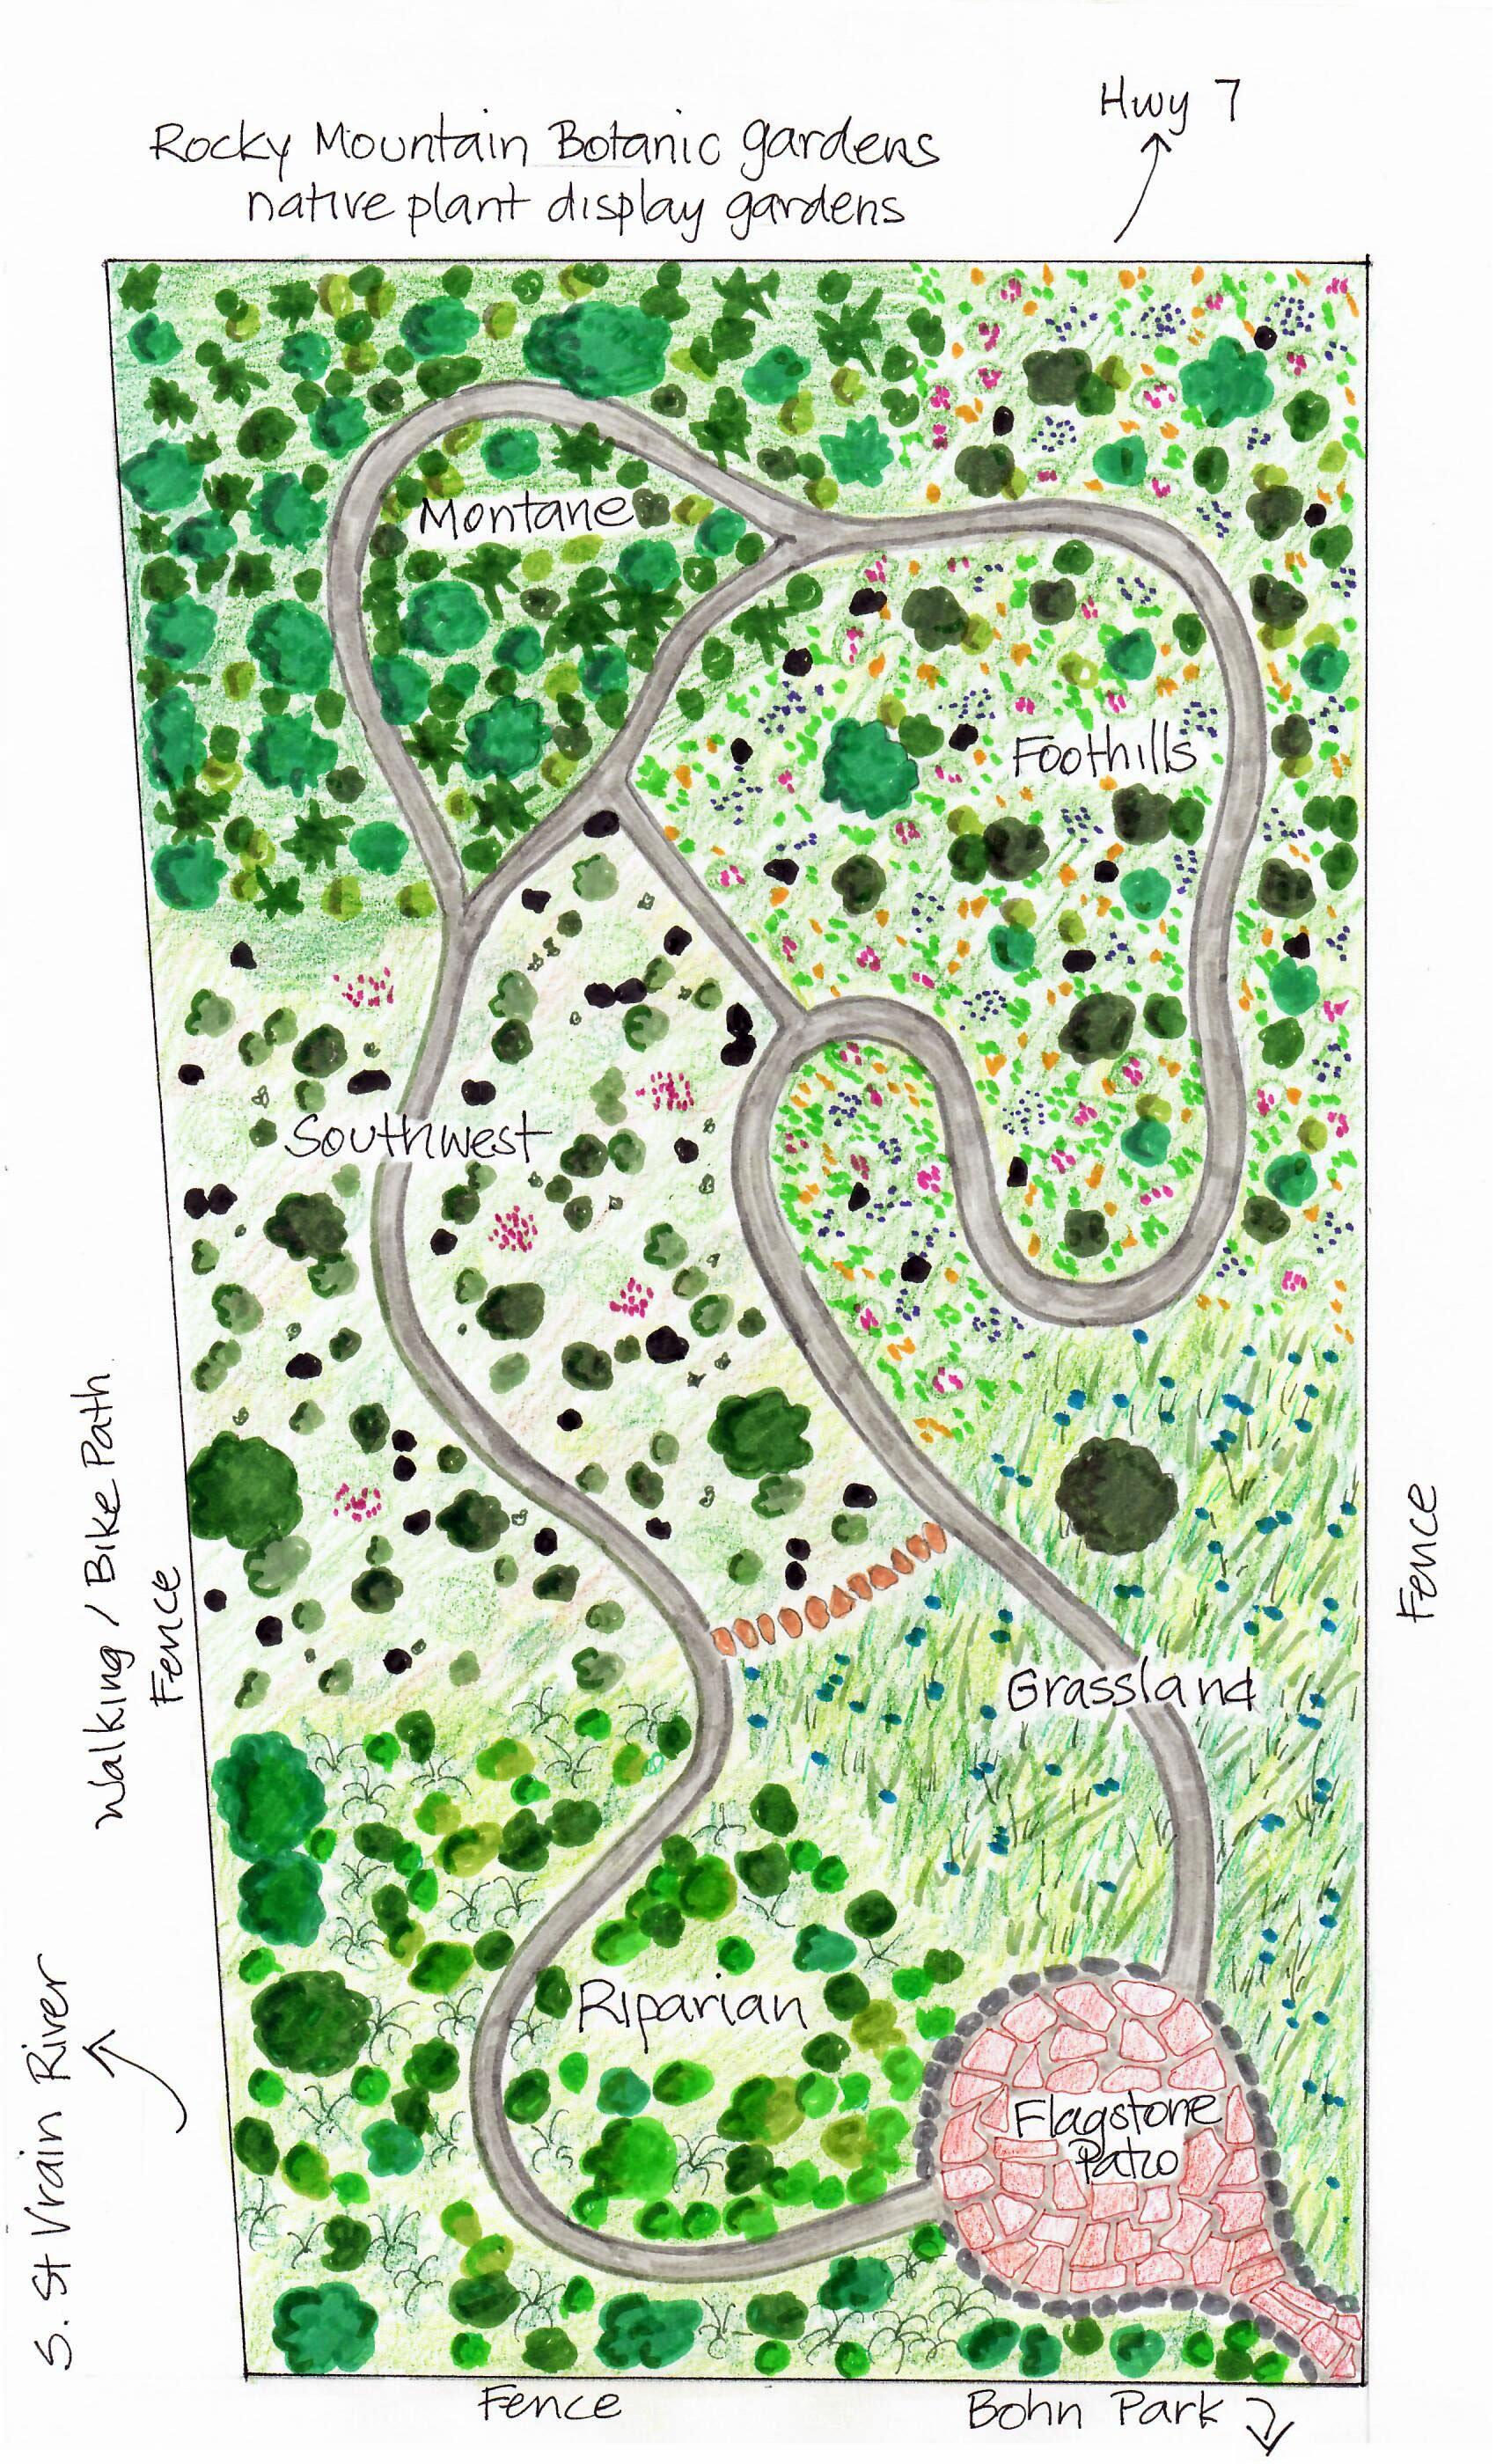 https://sites.google.com/a/rmbg.org/rmbg/our-gardens/RMBG2.jpg